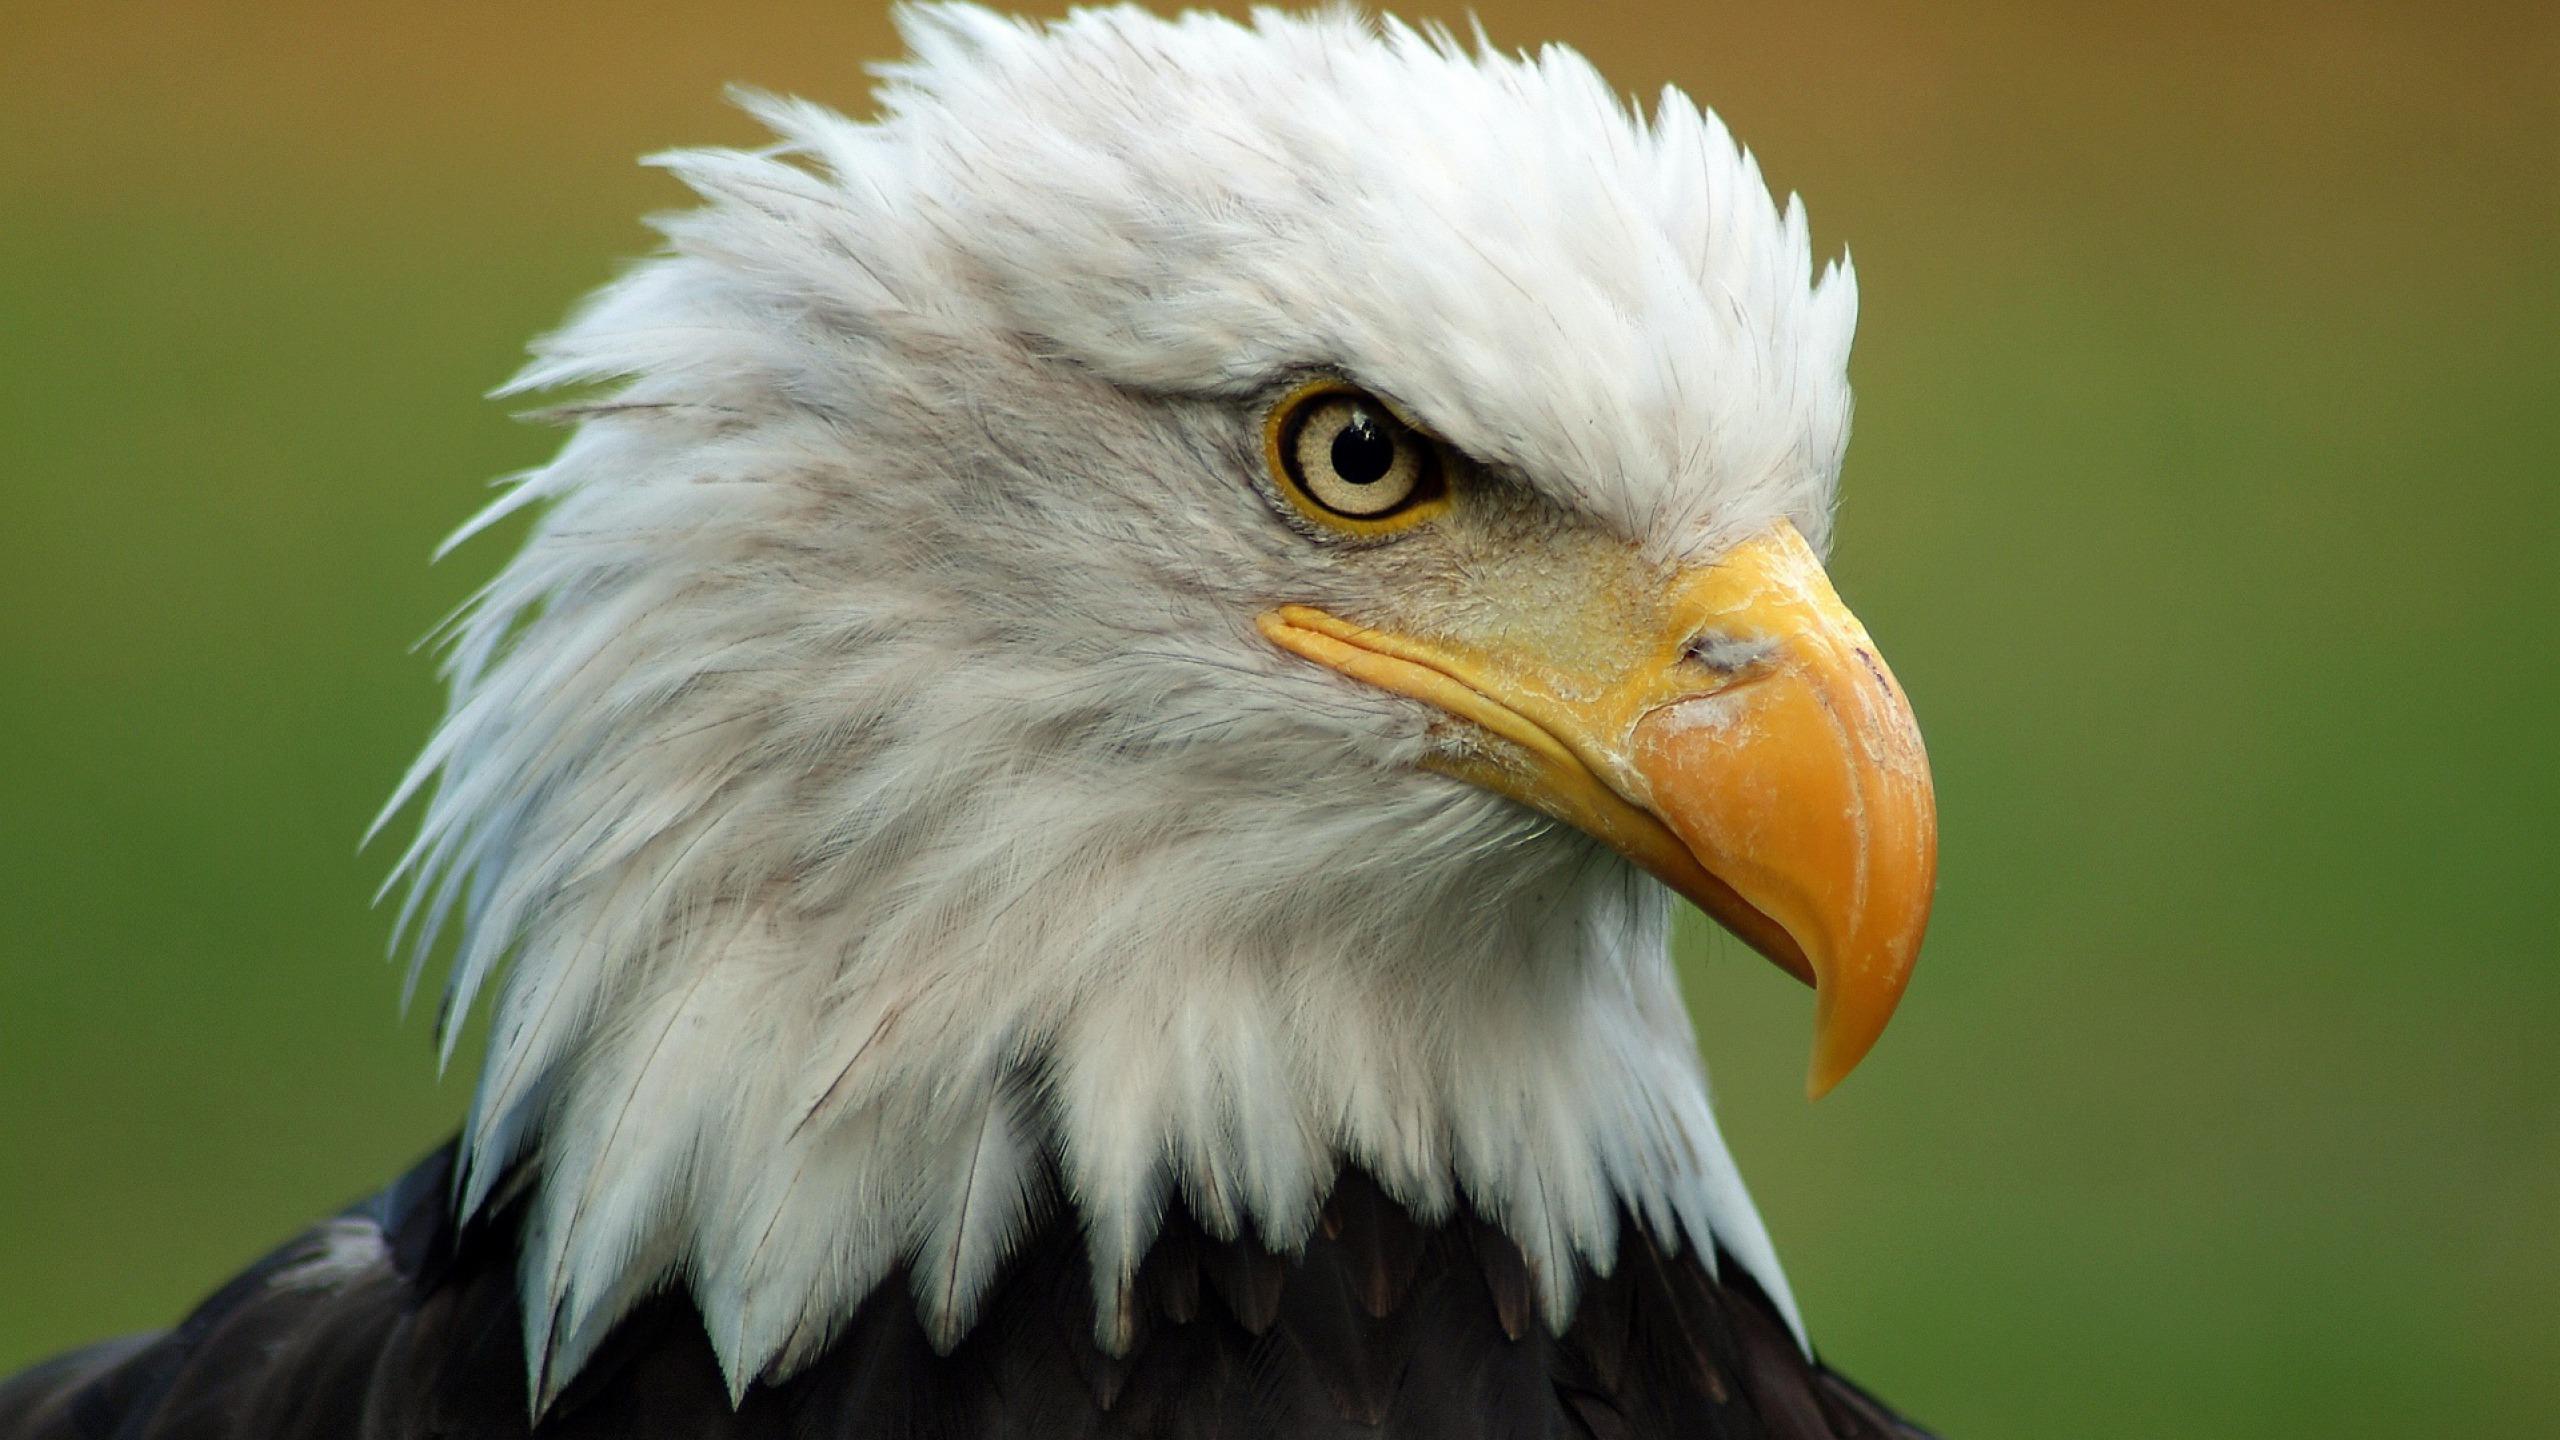 bald eagle hd wallpapers beautiful desktop background images 2560x1440